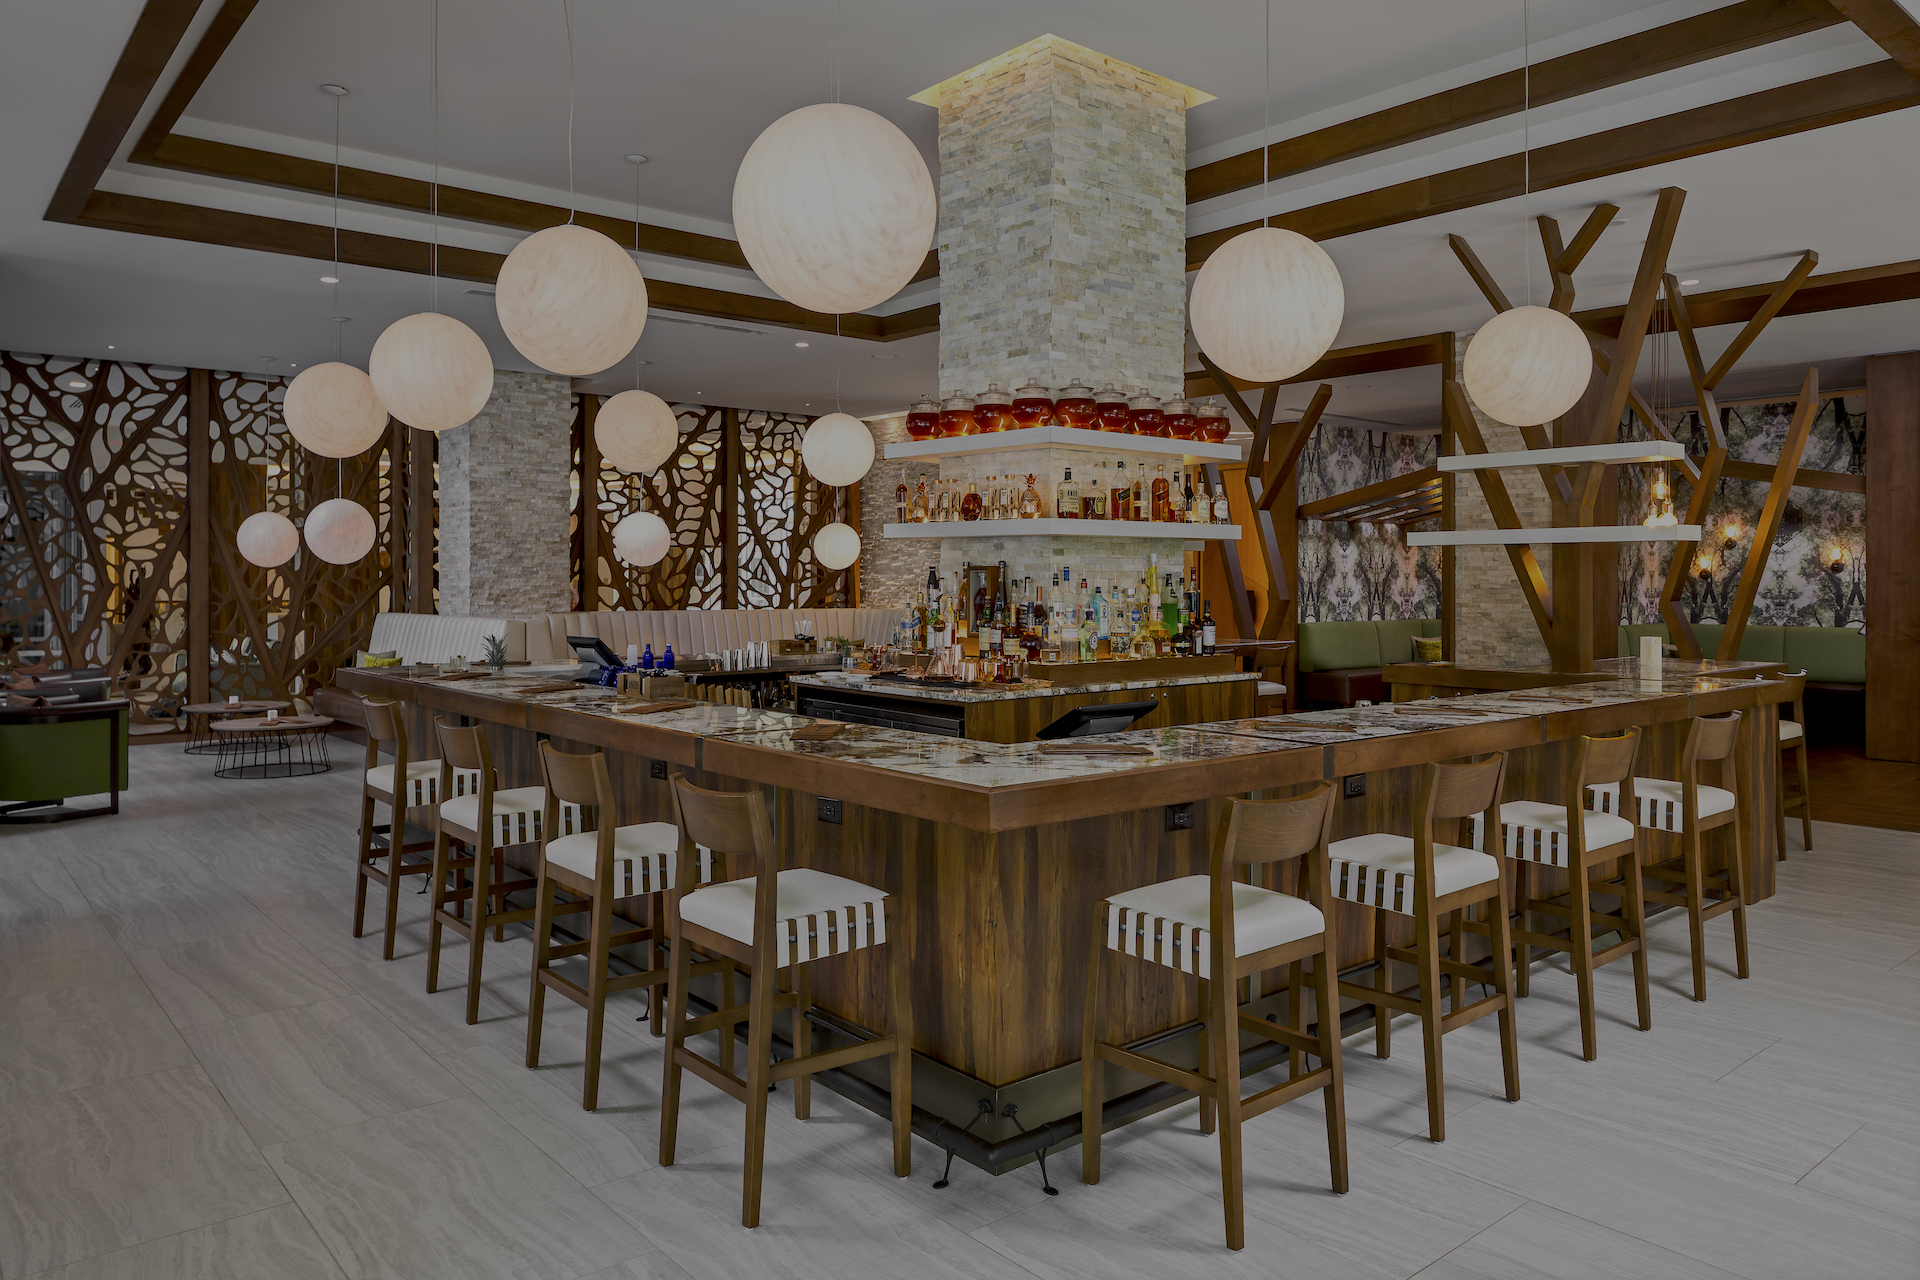 Oak and Honey Bar, Greenville SC